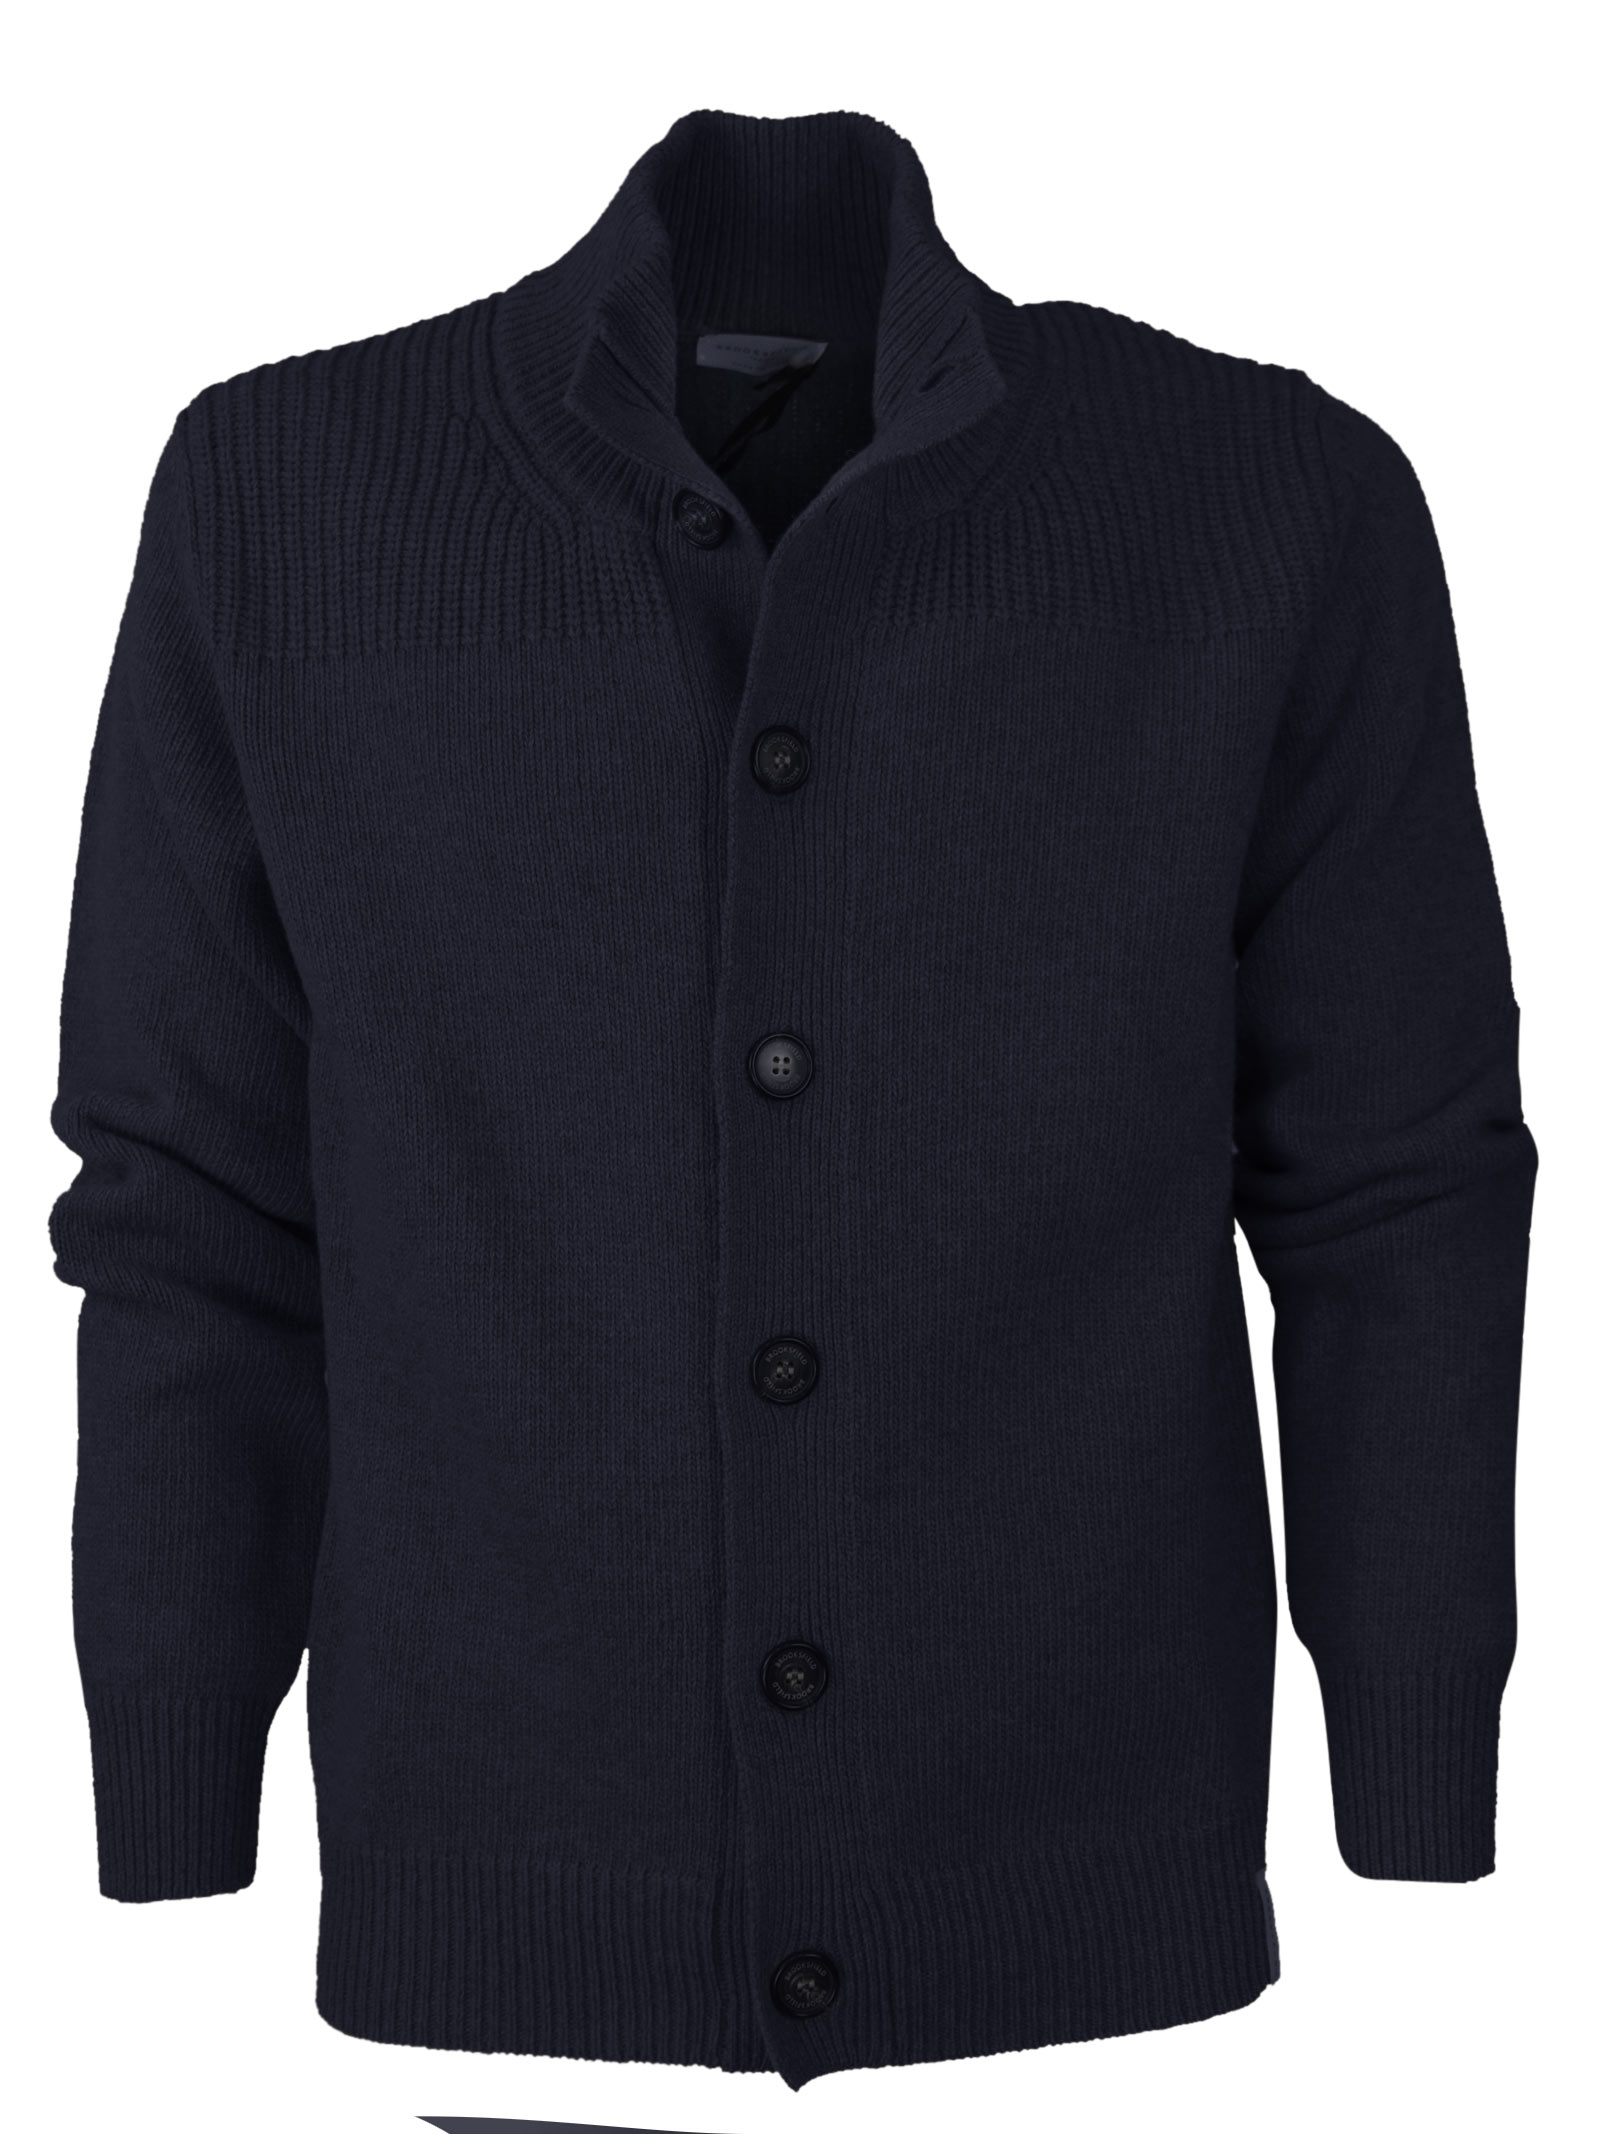 High collar botton up sweater  BROOKSFIELD   Knitwear   203I.M0059608